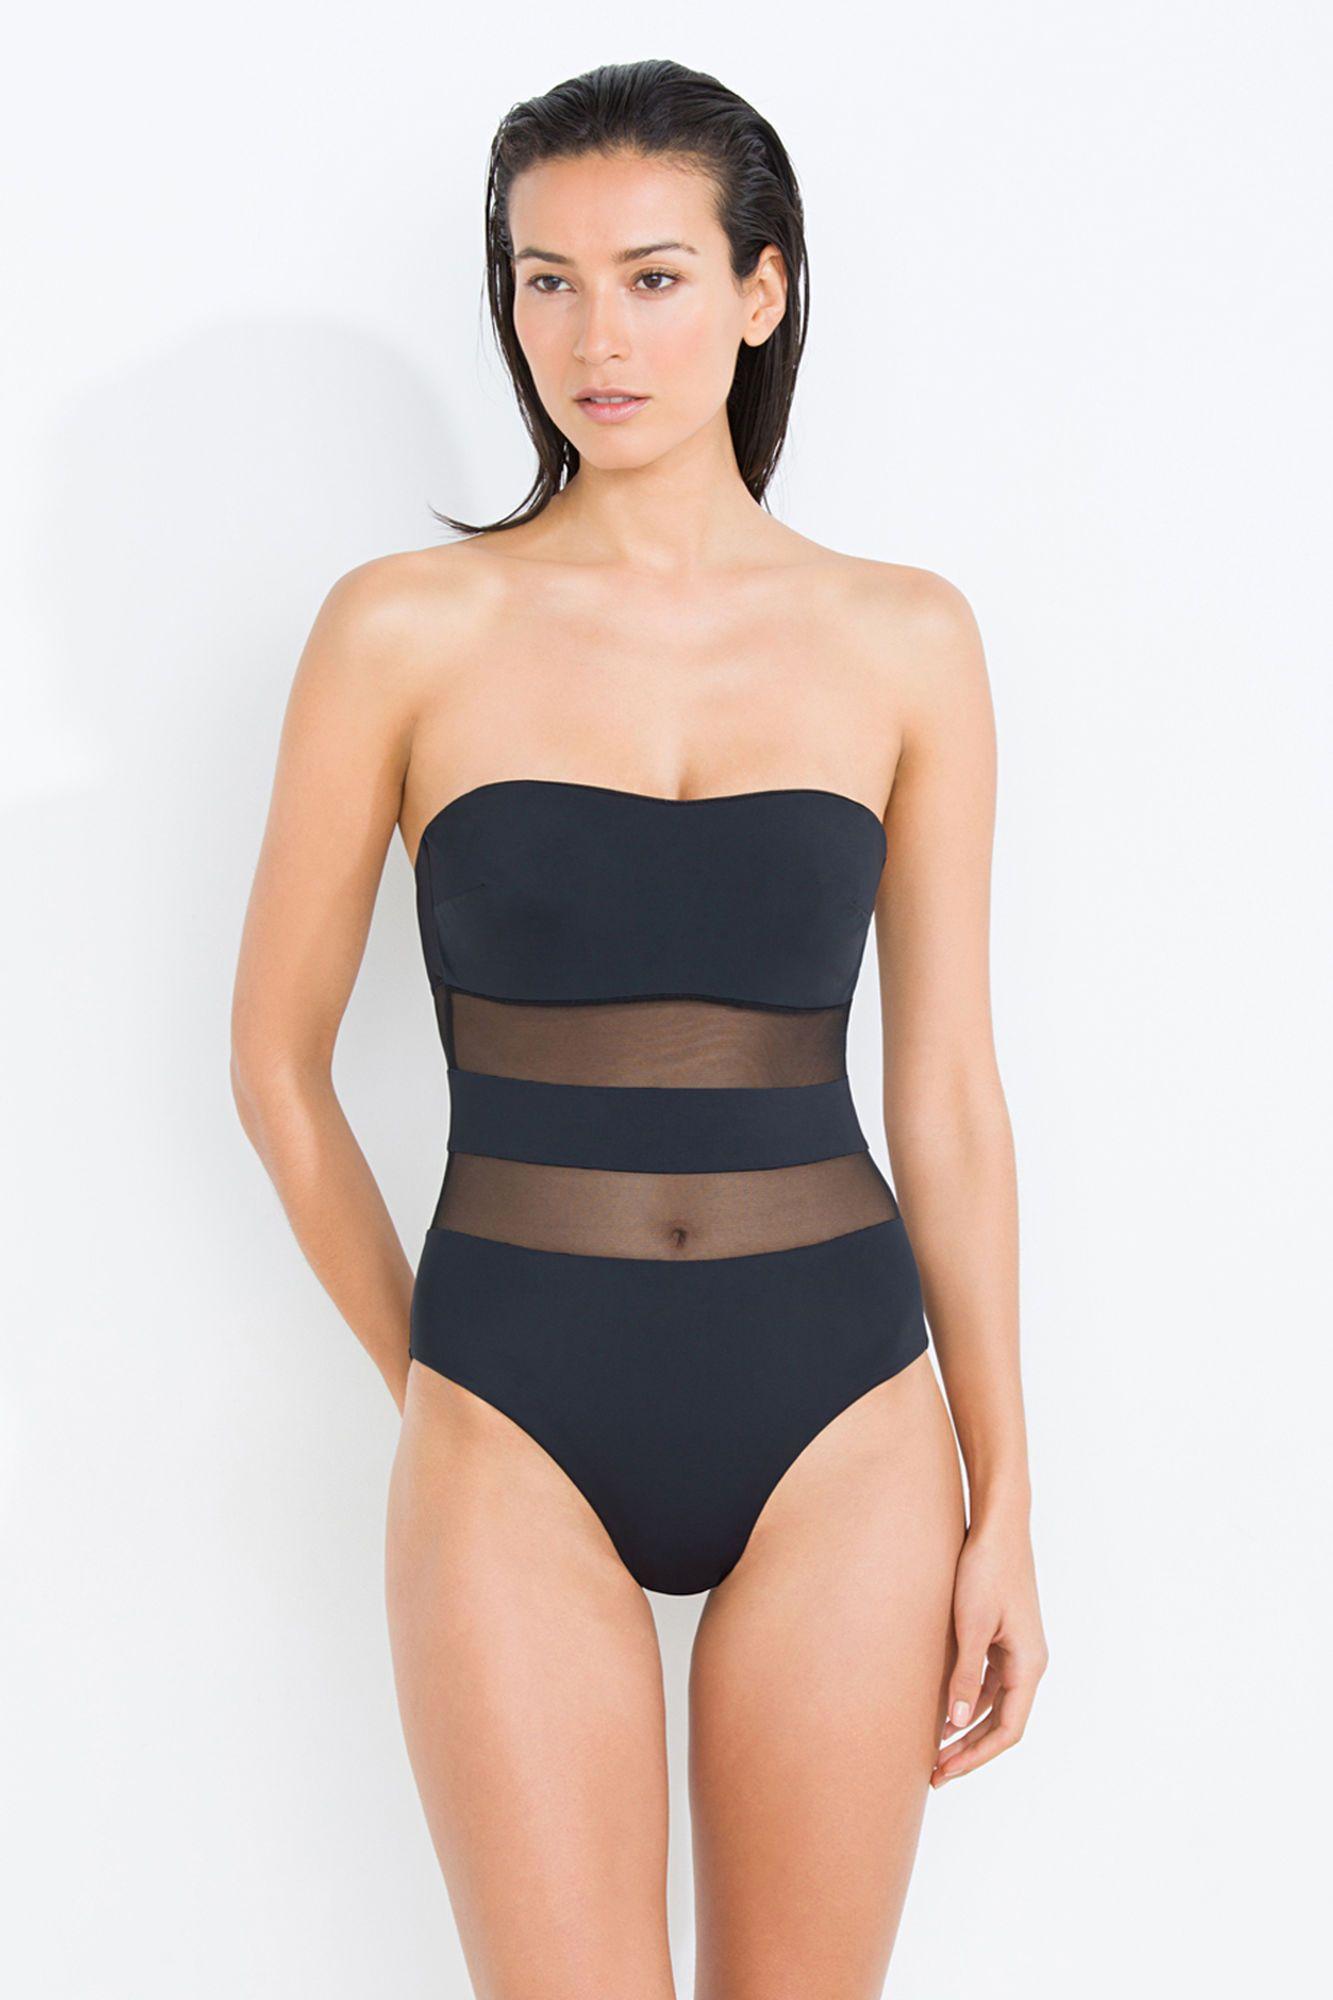 Swimsuit Enhancing Shape Semi Sheer SwimsuitsRopa Stripes With XukOPZi